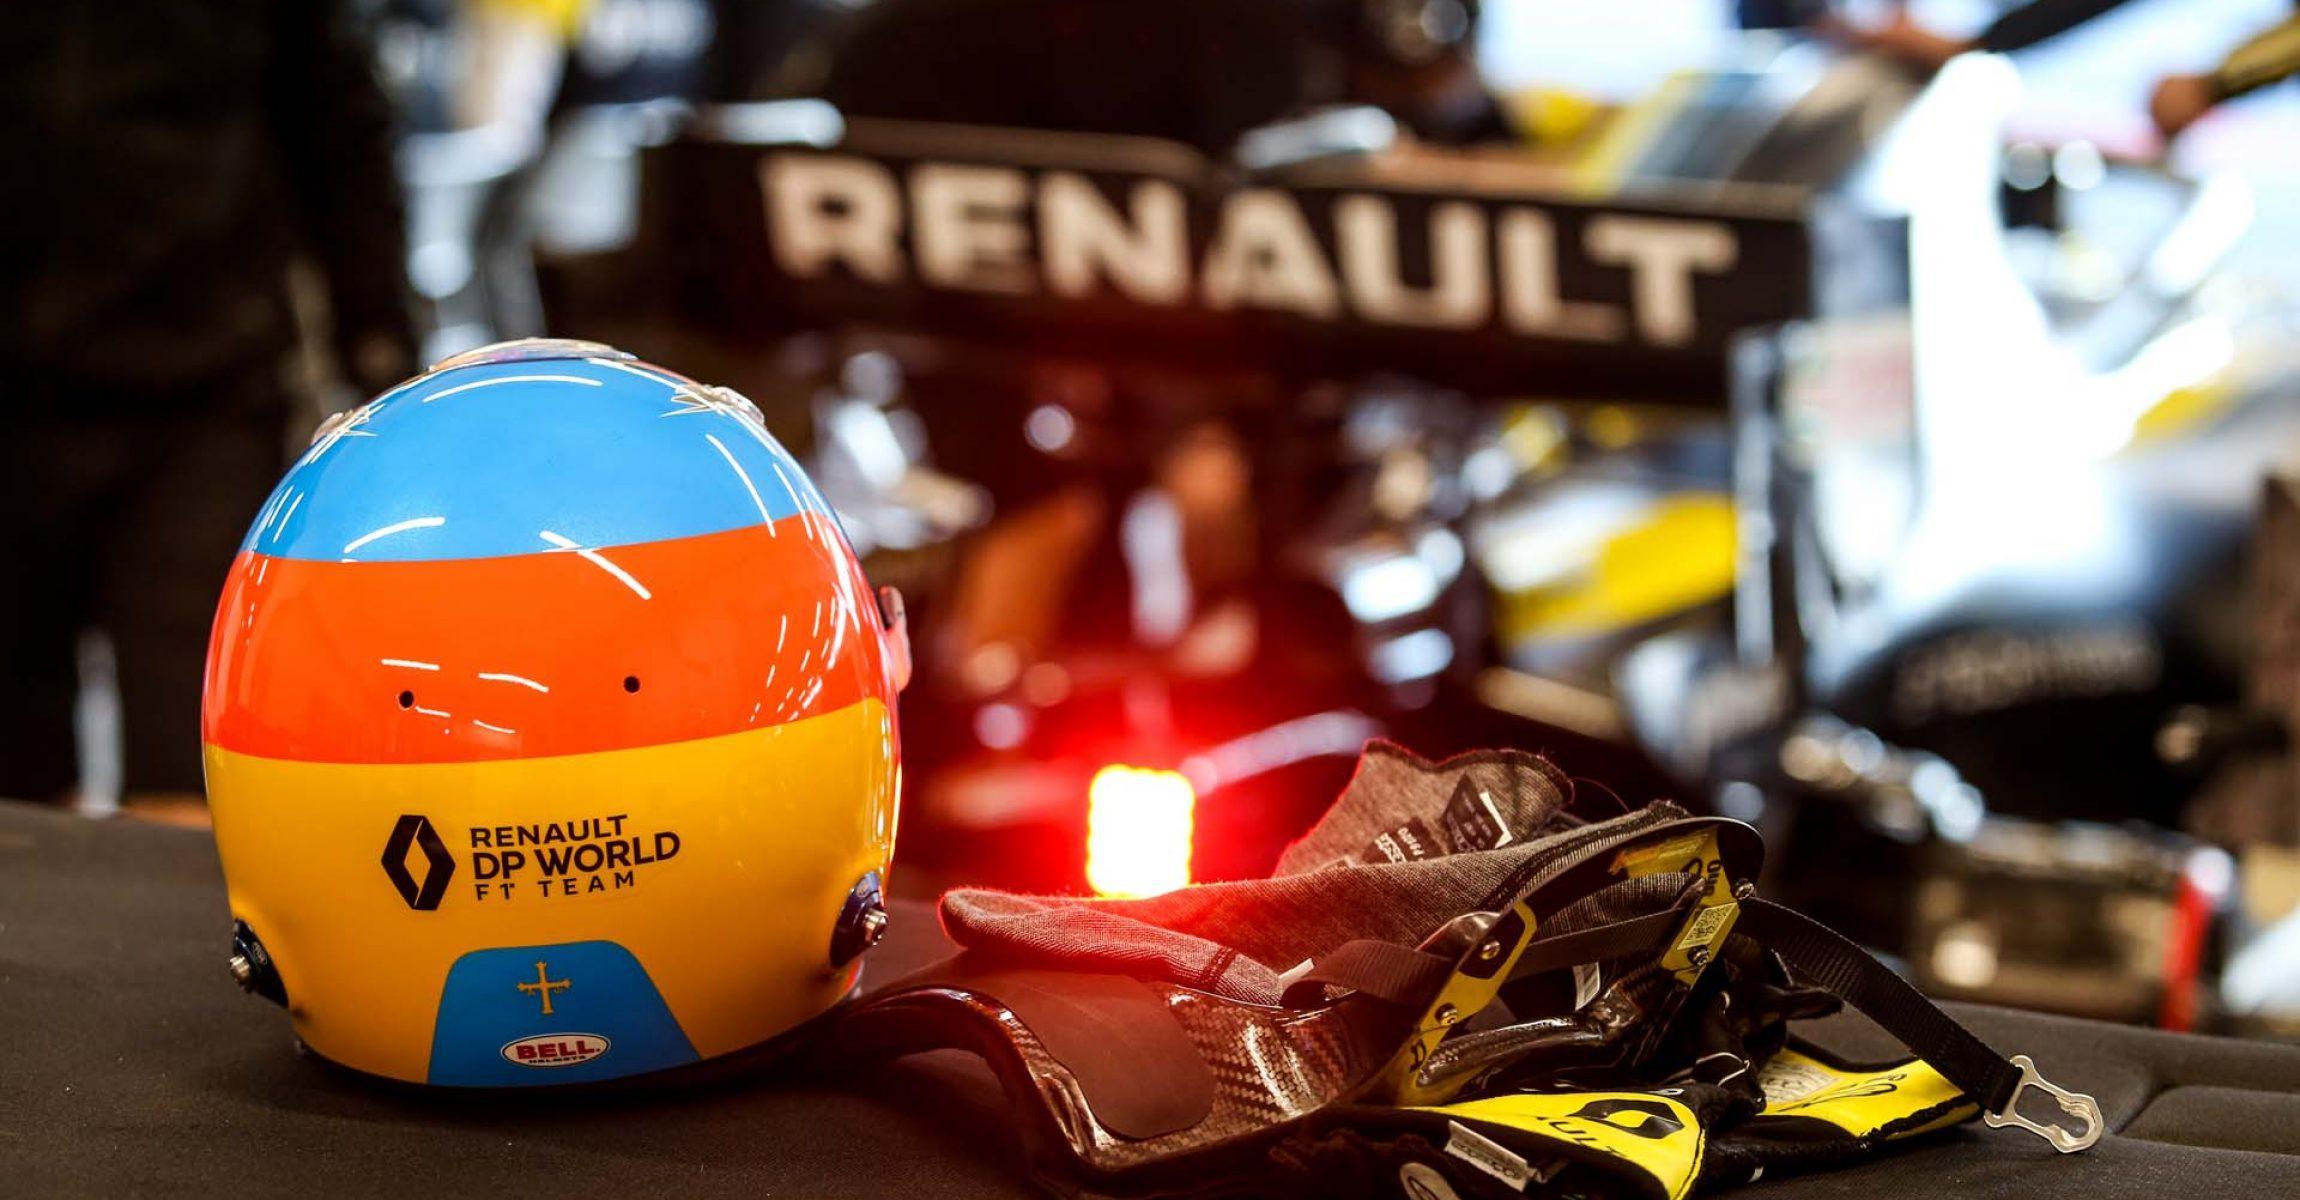 The helmet of Fernando Alonso (ESP) Renault F1 Team. Renault F1 Team Film Day, Tuesday 13th October 2020. Barcelona, Spain.